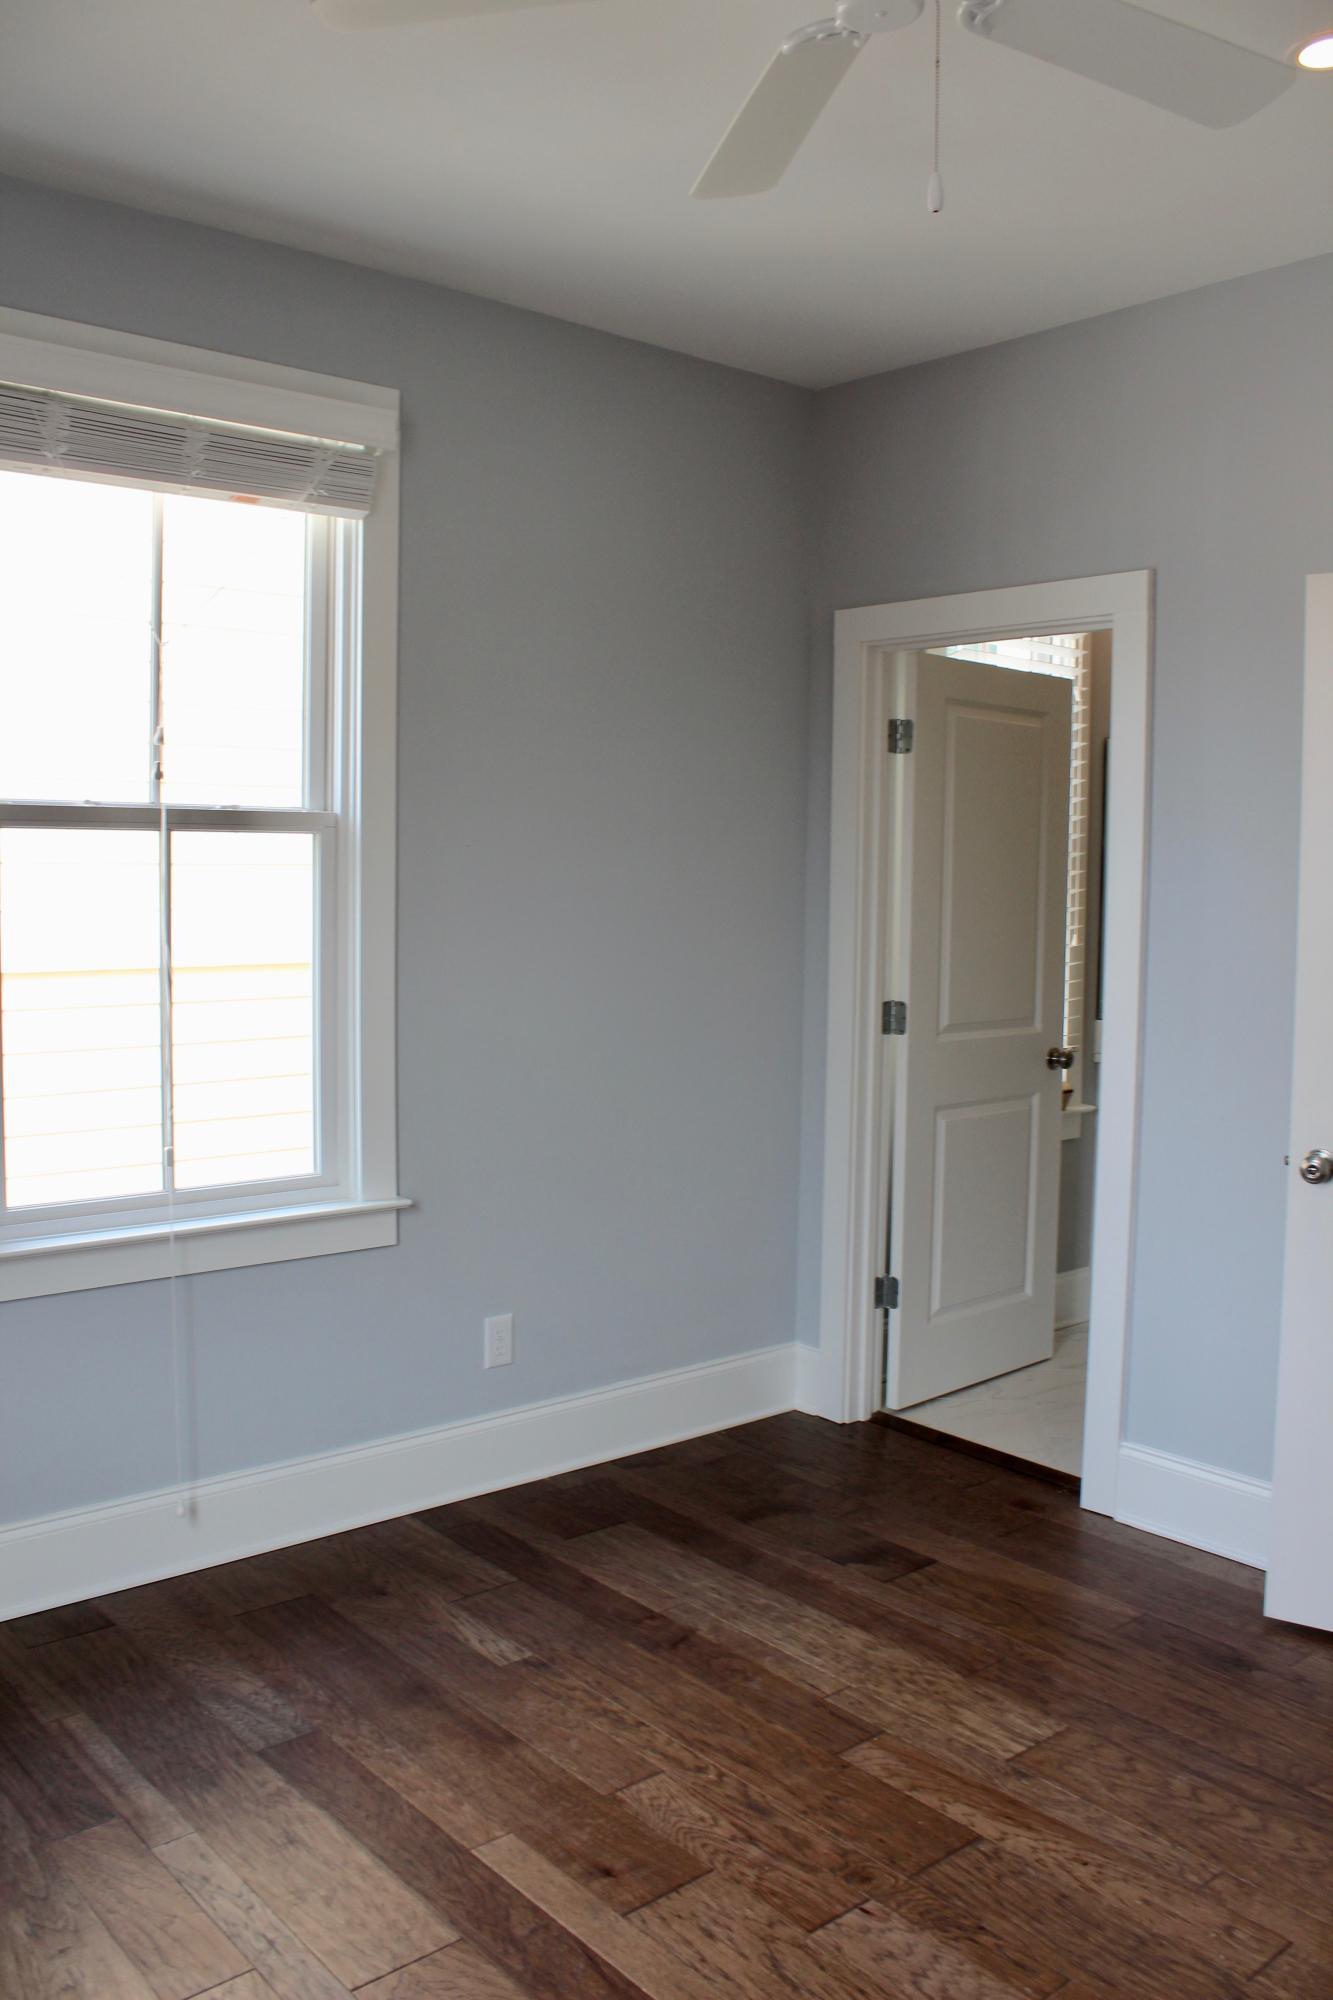 Morris Square Homes For Sale - 46 Dereef, Charleston, SC - 25